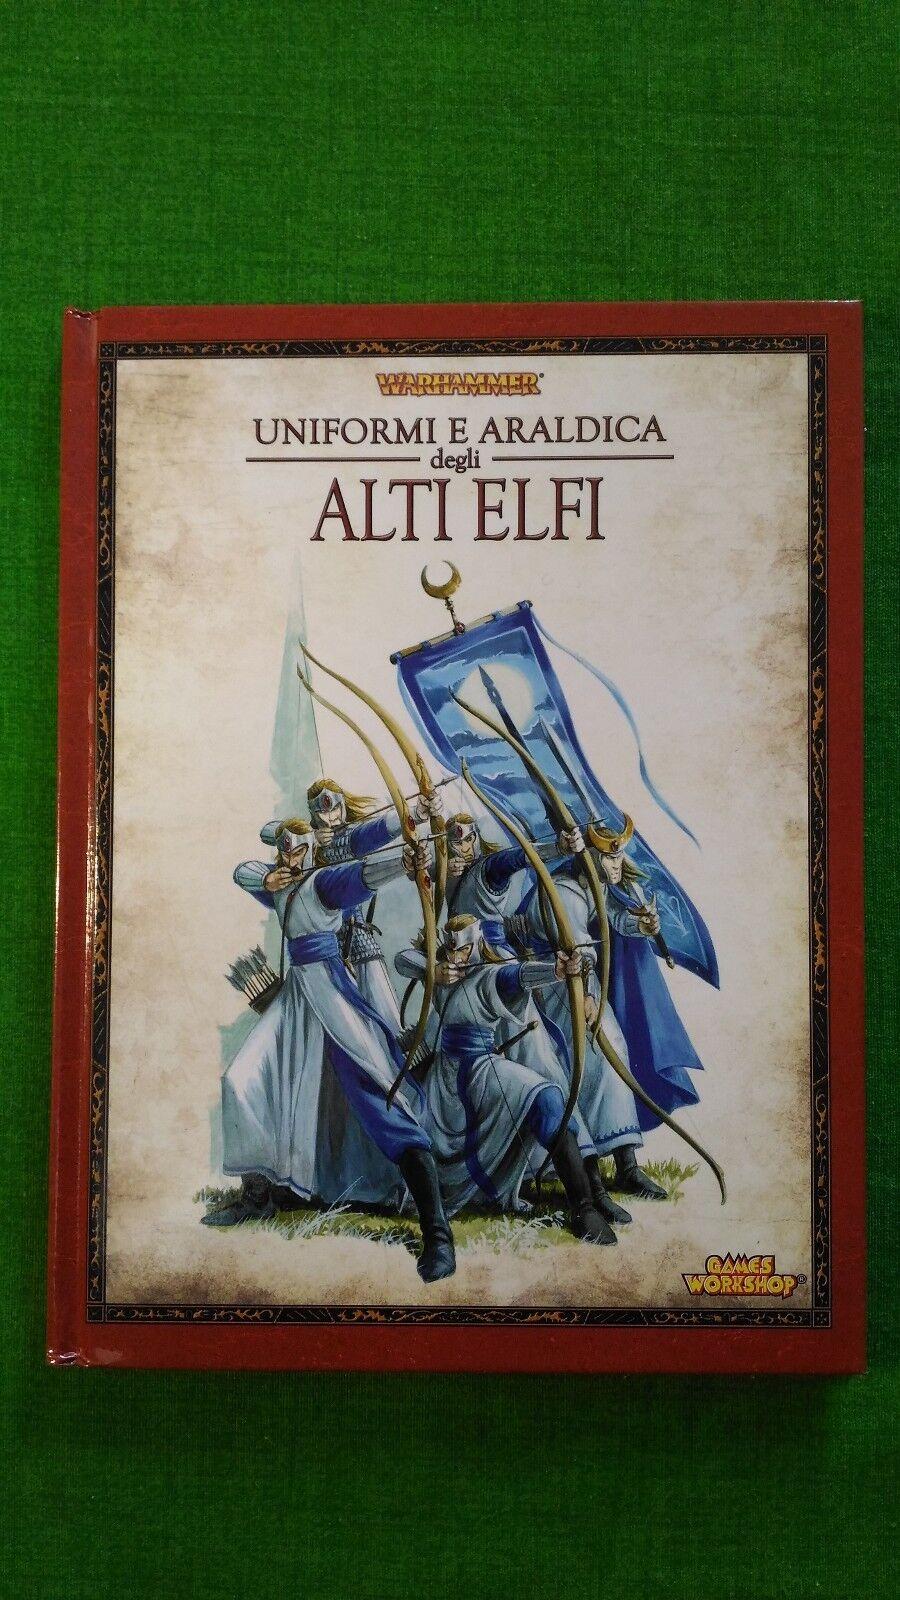 Warhammer fantasy - Uniformi e araldica degli Alti Elfi - Games Workshop